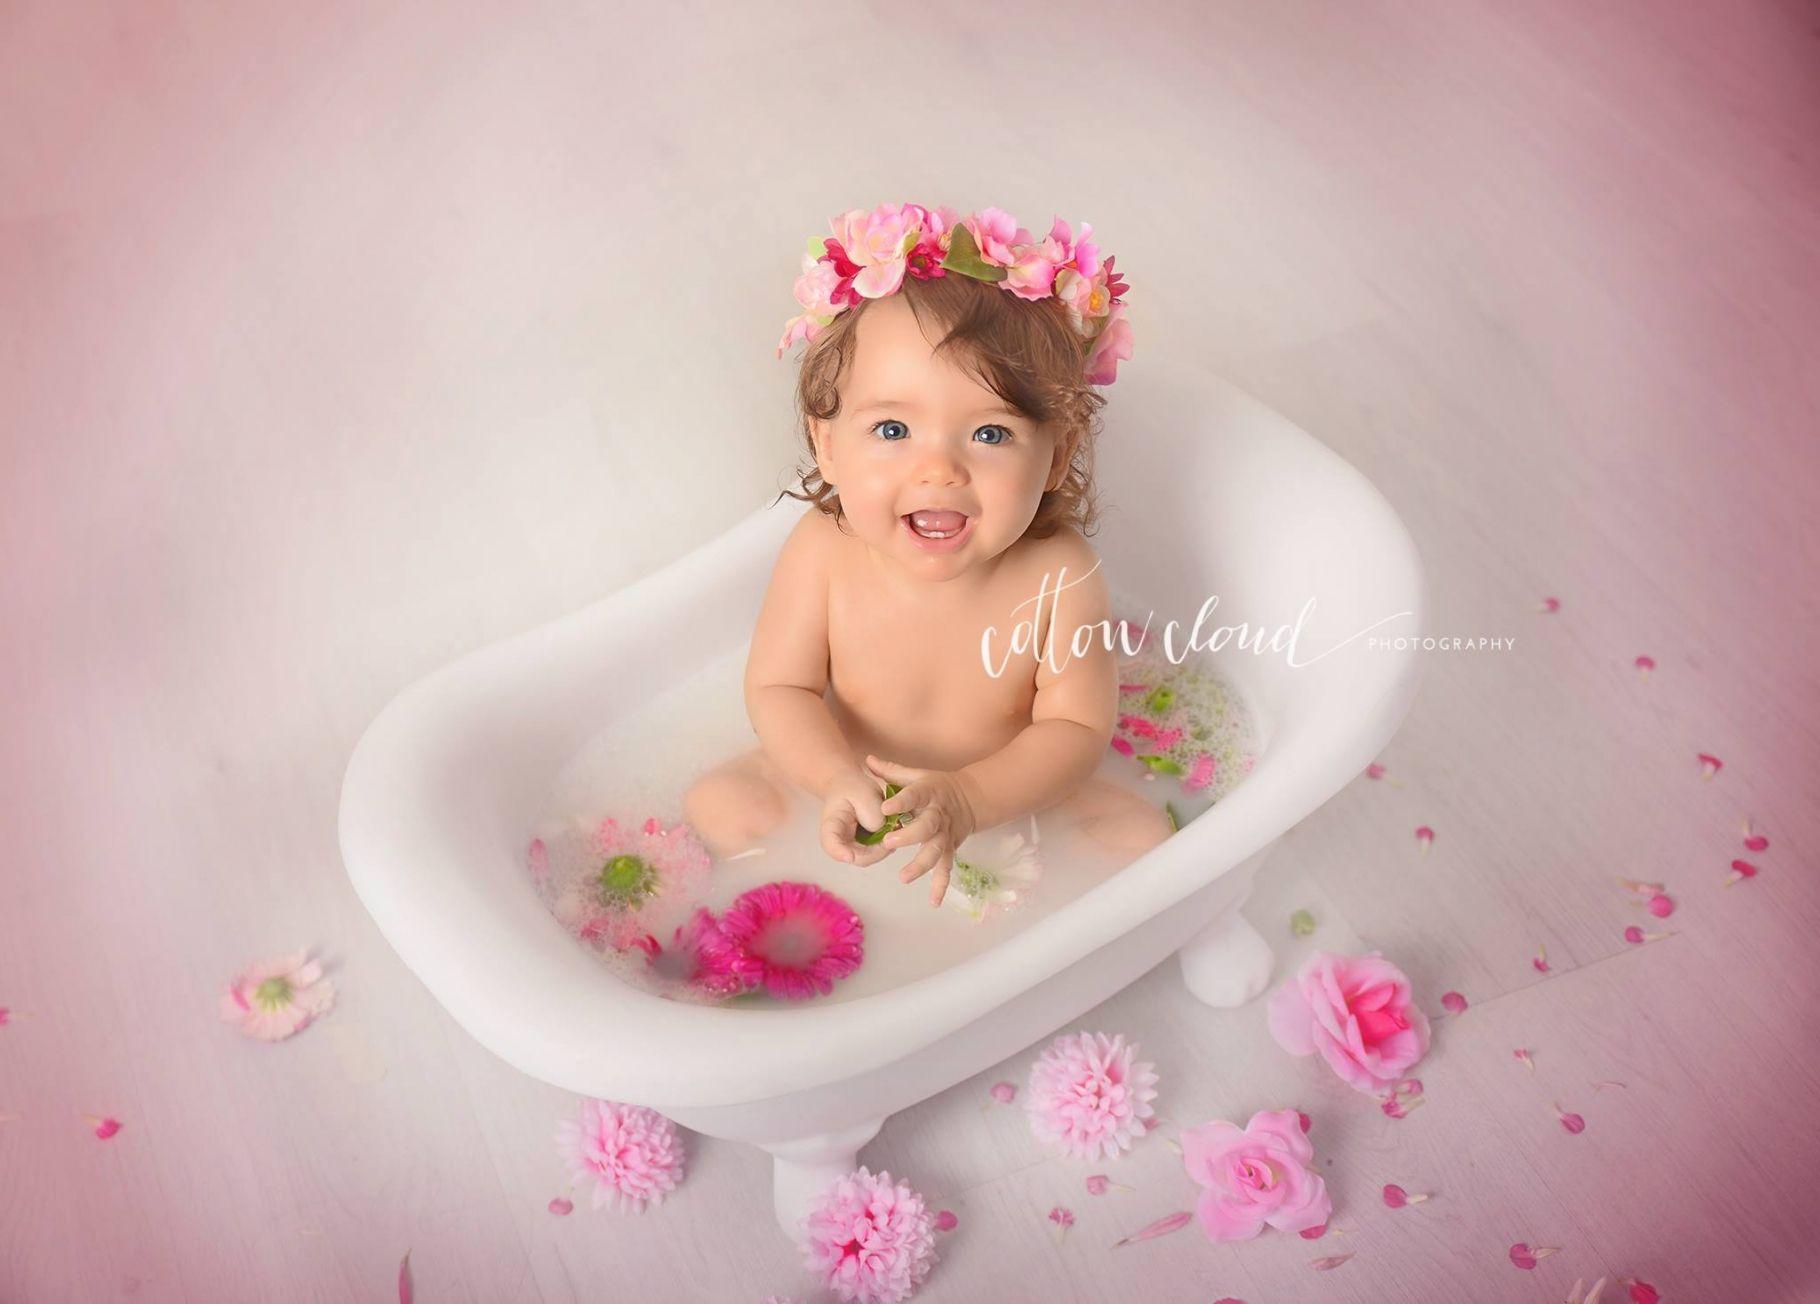 Cotton Cloud Photography Sydney - Milk Bath session Minis!!!! Baby ...